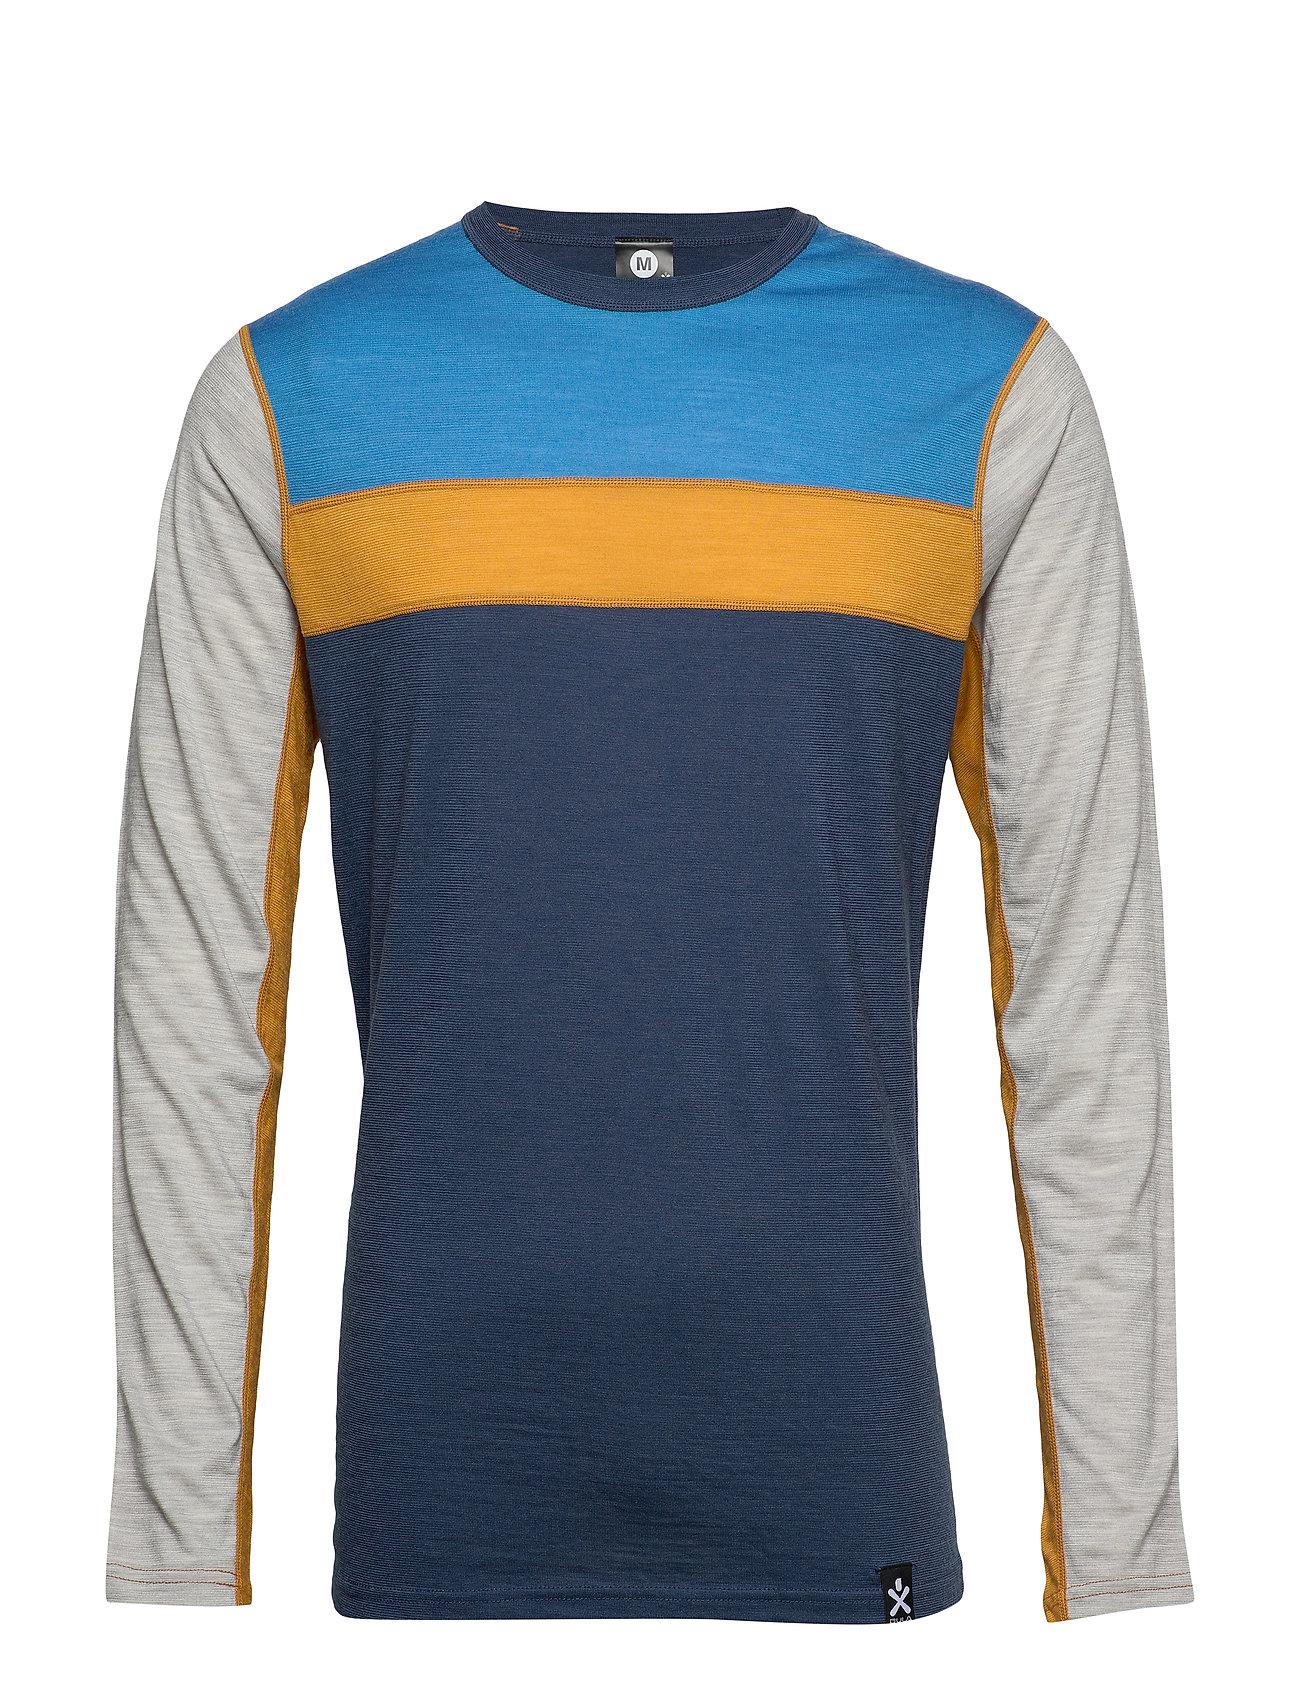 Image of Retro Wool Crew Base Layer Tops Blå Bula (3406243091)